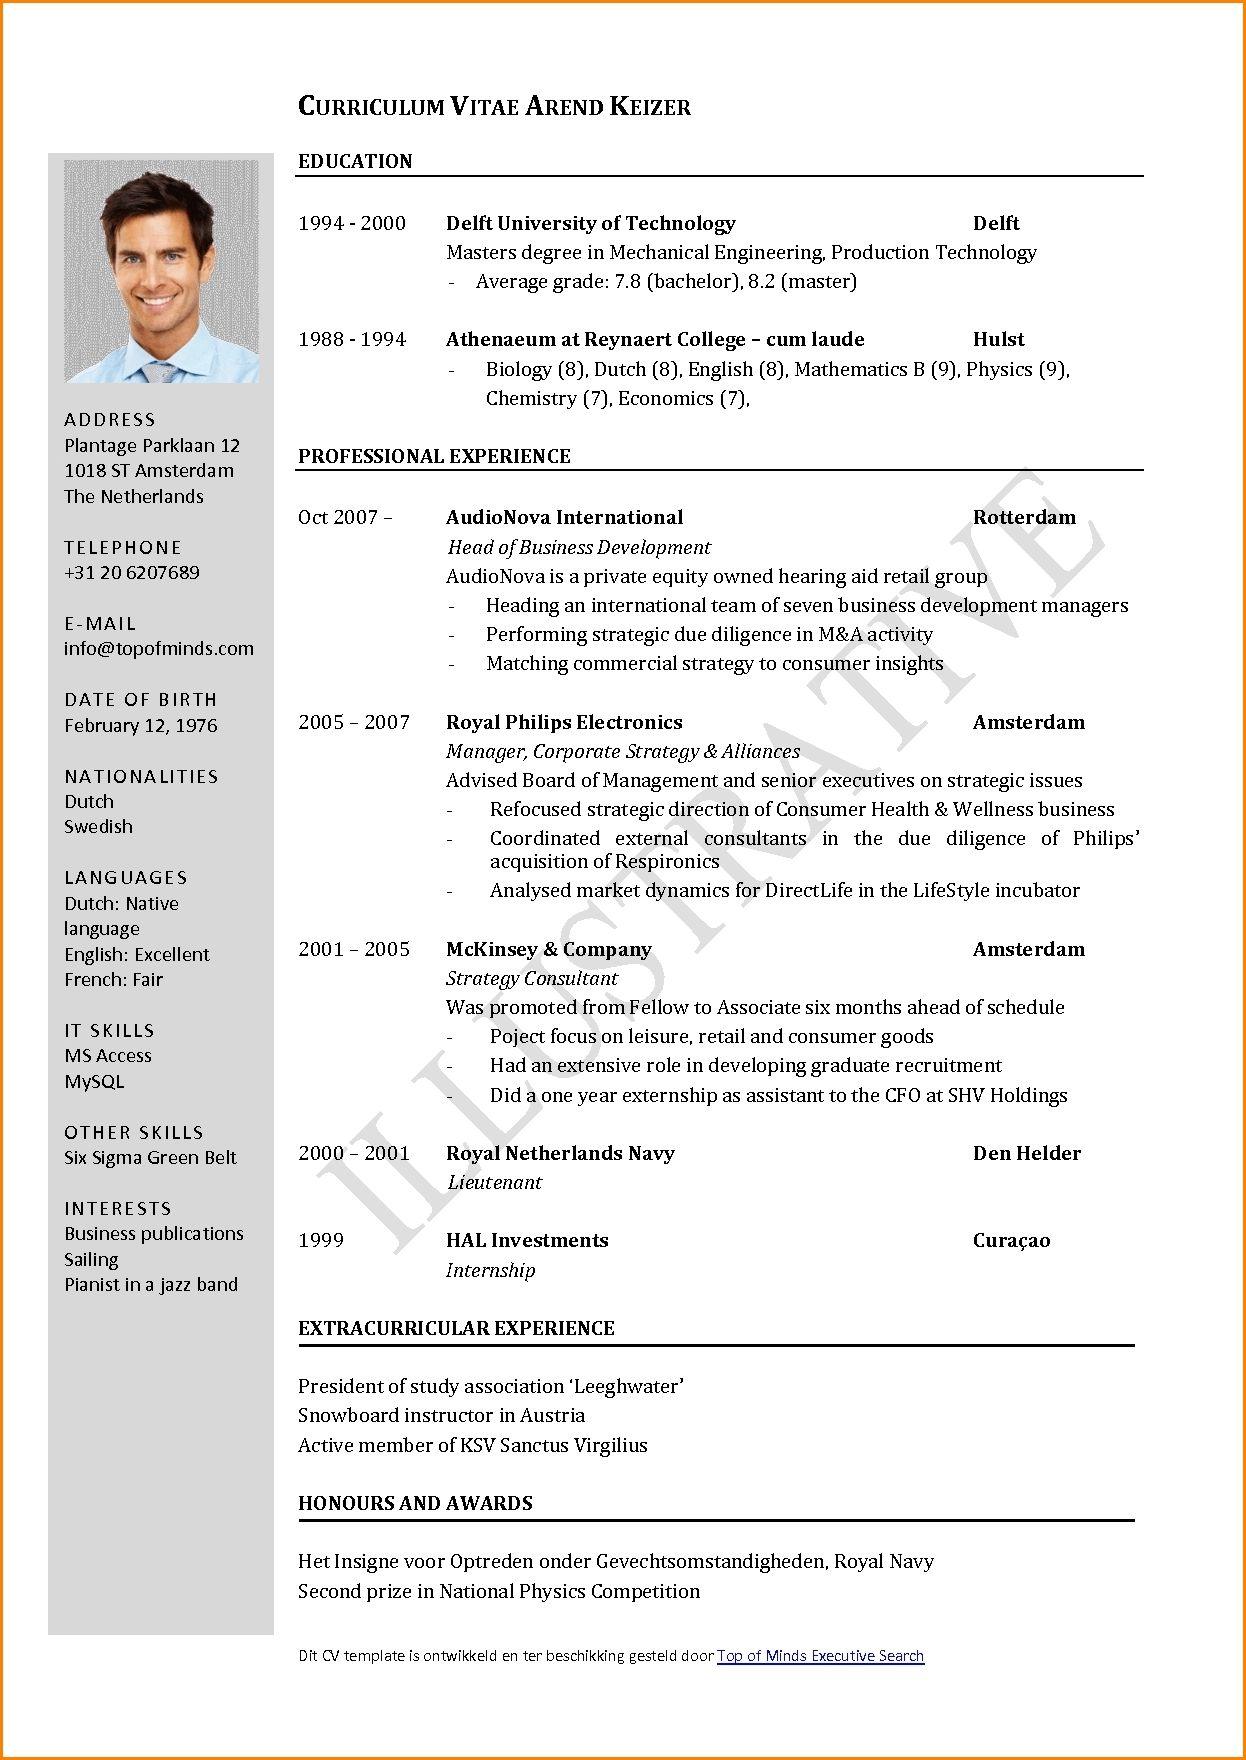 Sales Curriculum Vitae How To Draft A Sales Curriculum Vitae Download This Sales Curriculum Vitae Temp Curriculum Vitae Template Curriculum Vitae Curriculum